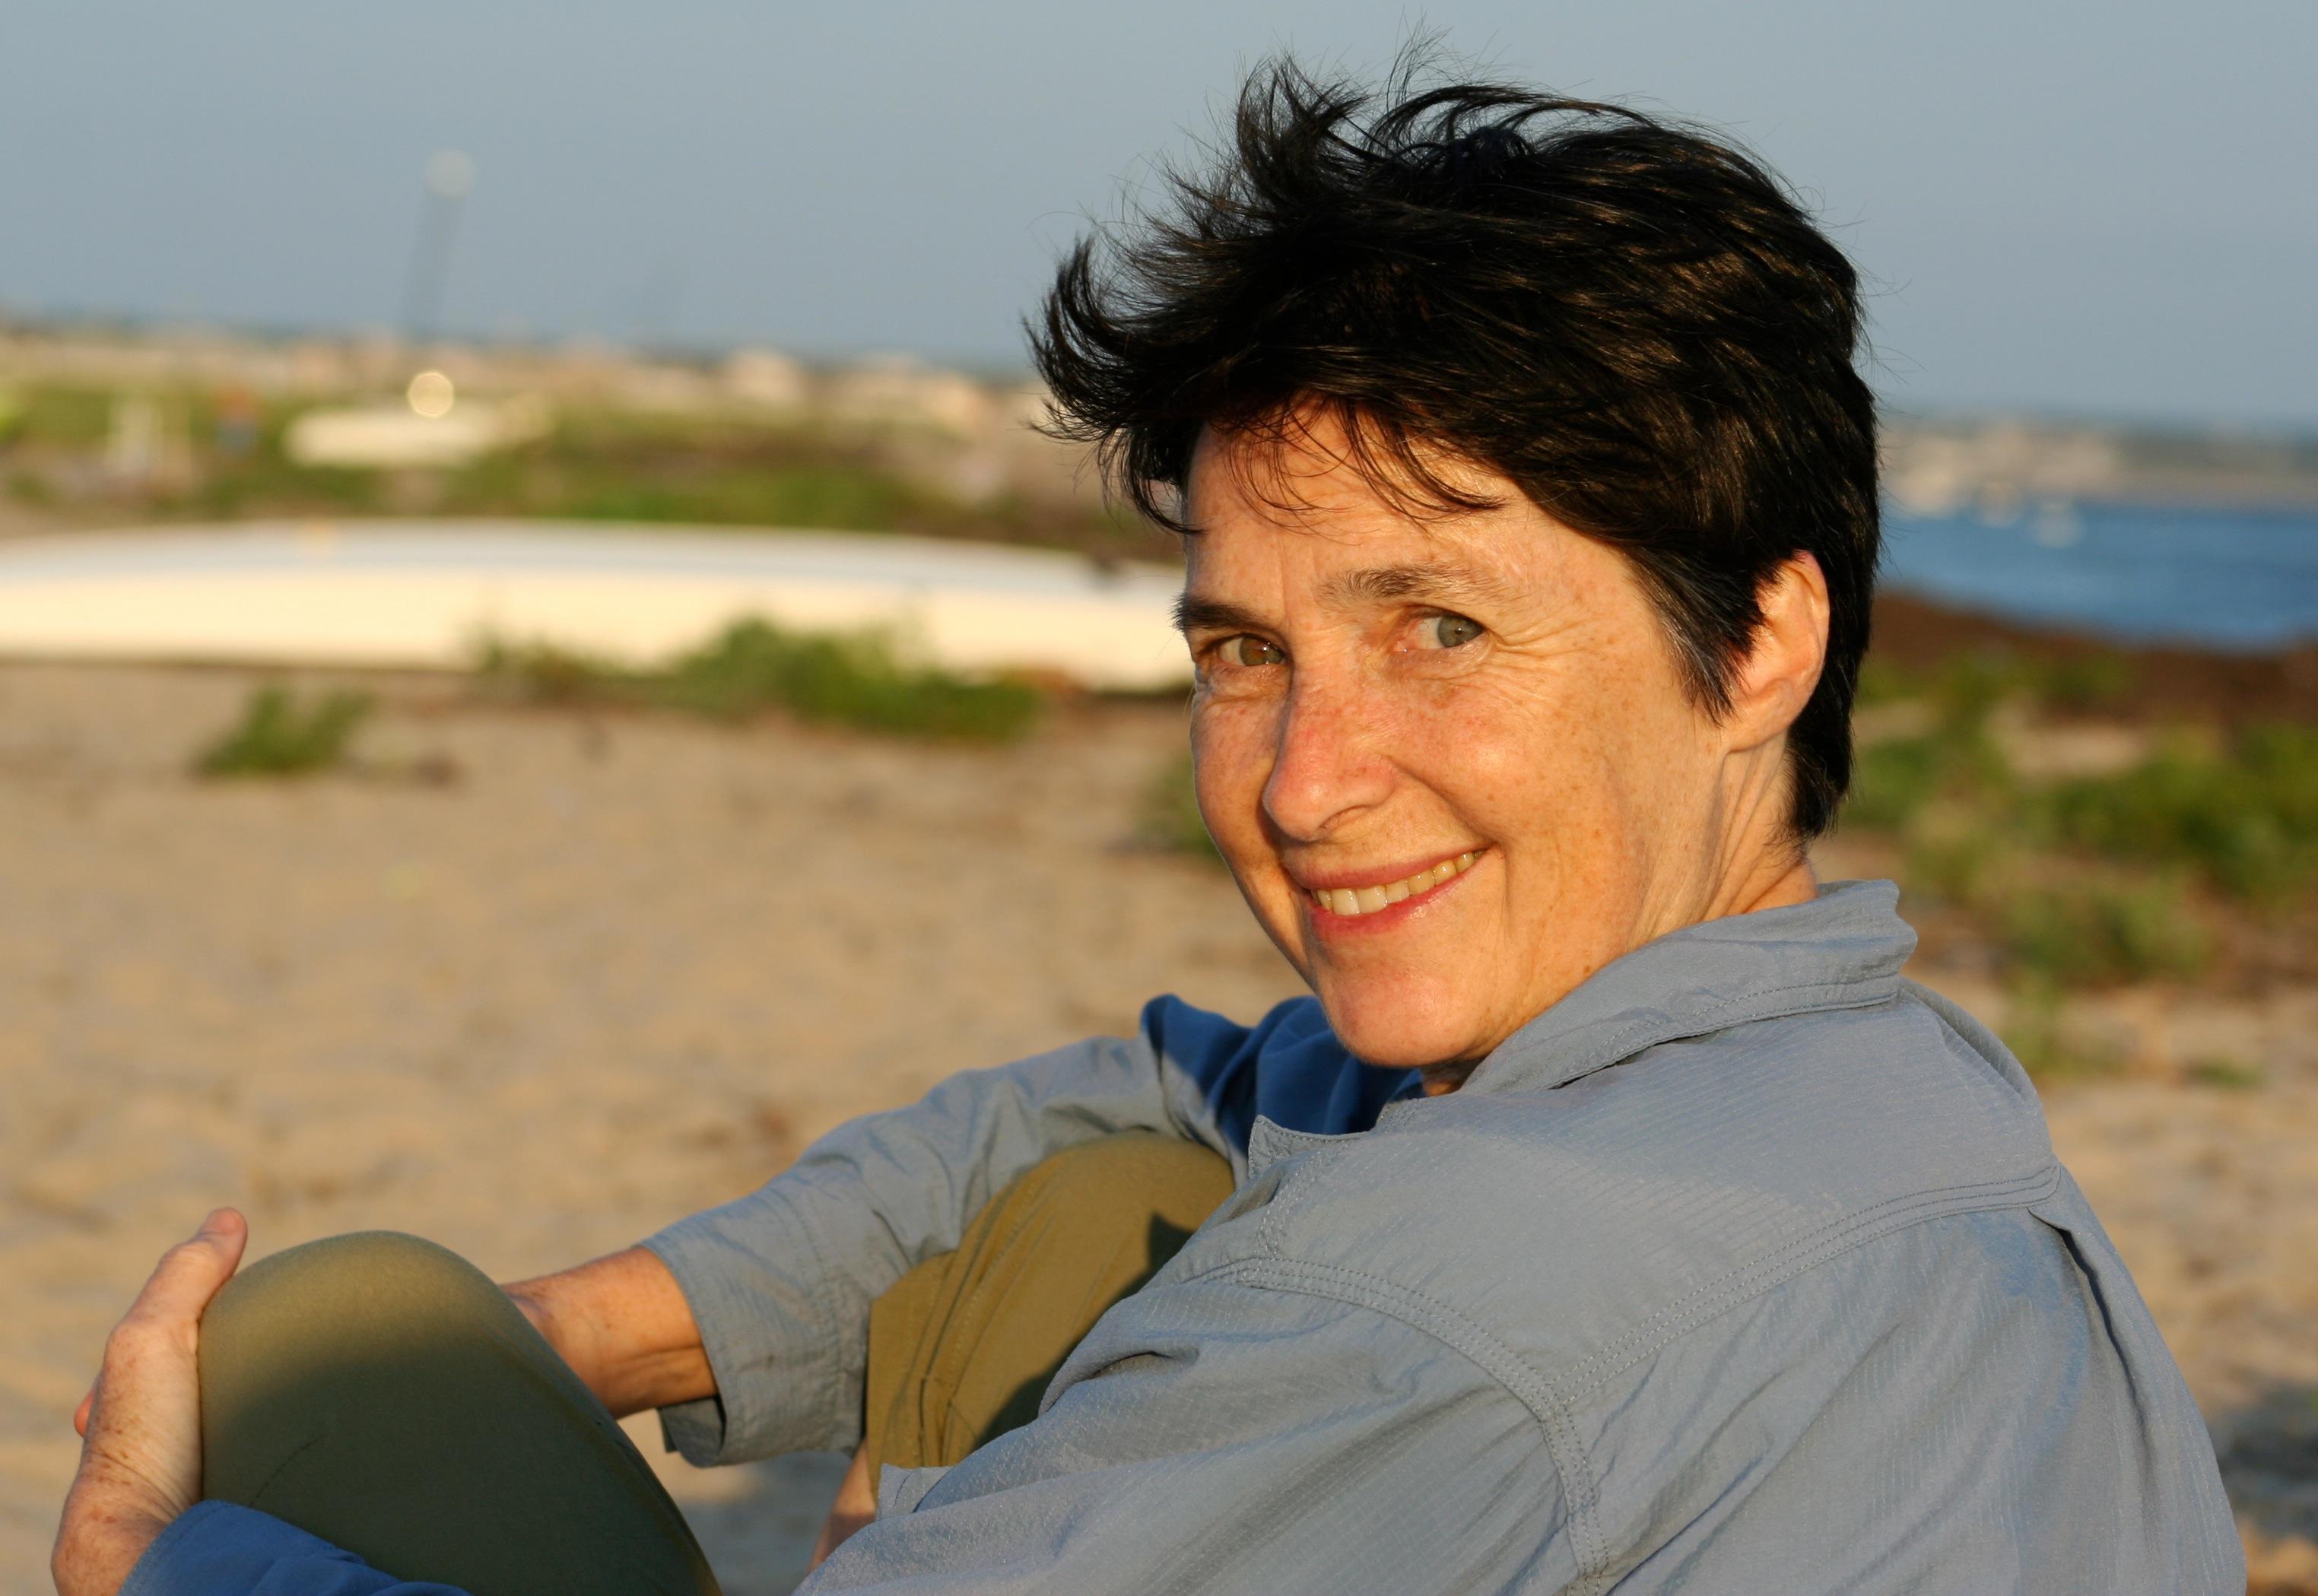 Laura Jean Sharkey Laurabeach